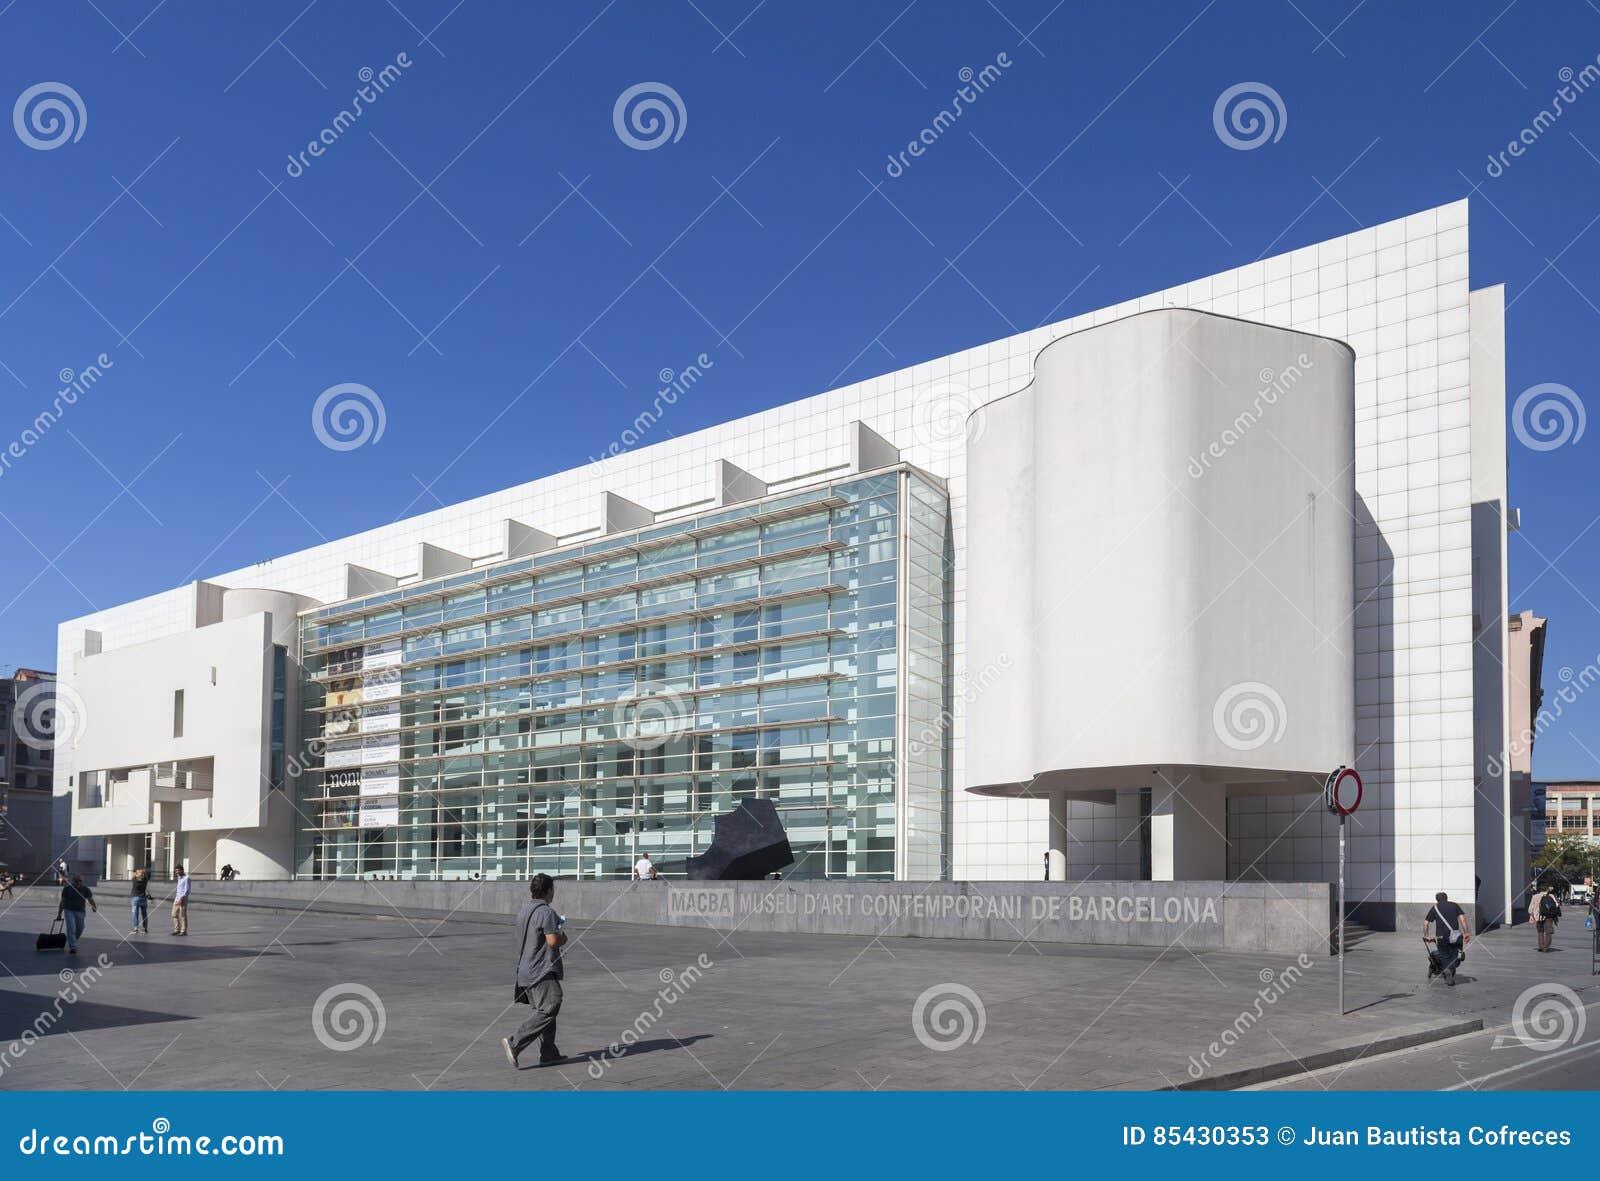 Modern Architecture Museum modern architecture, museum, macba-museu art contemporani